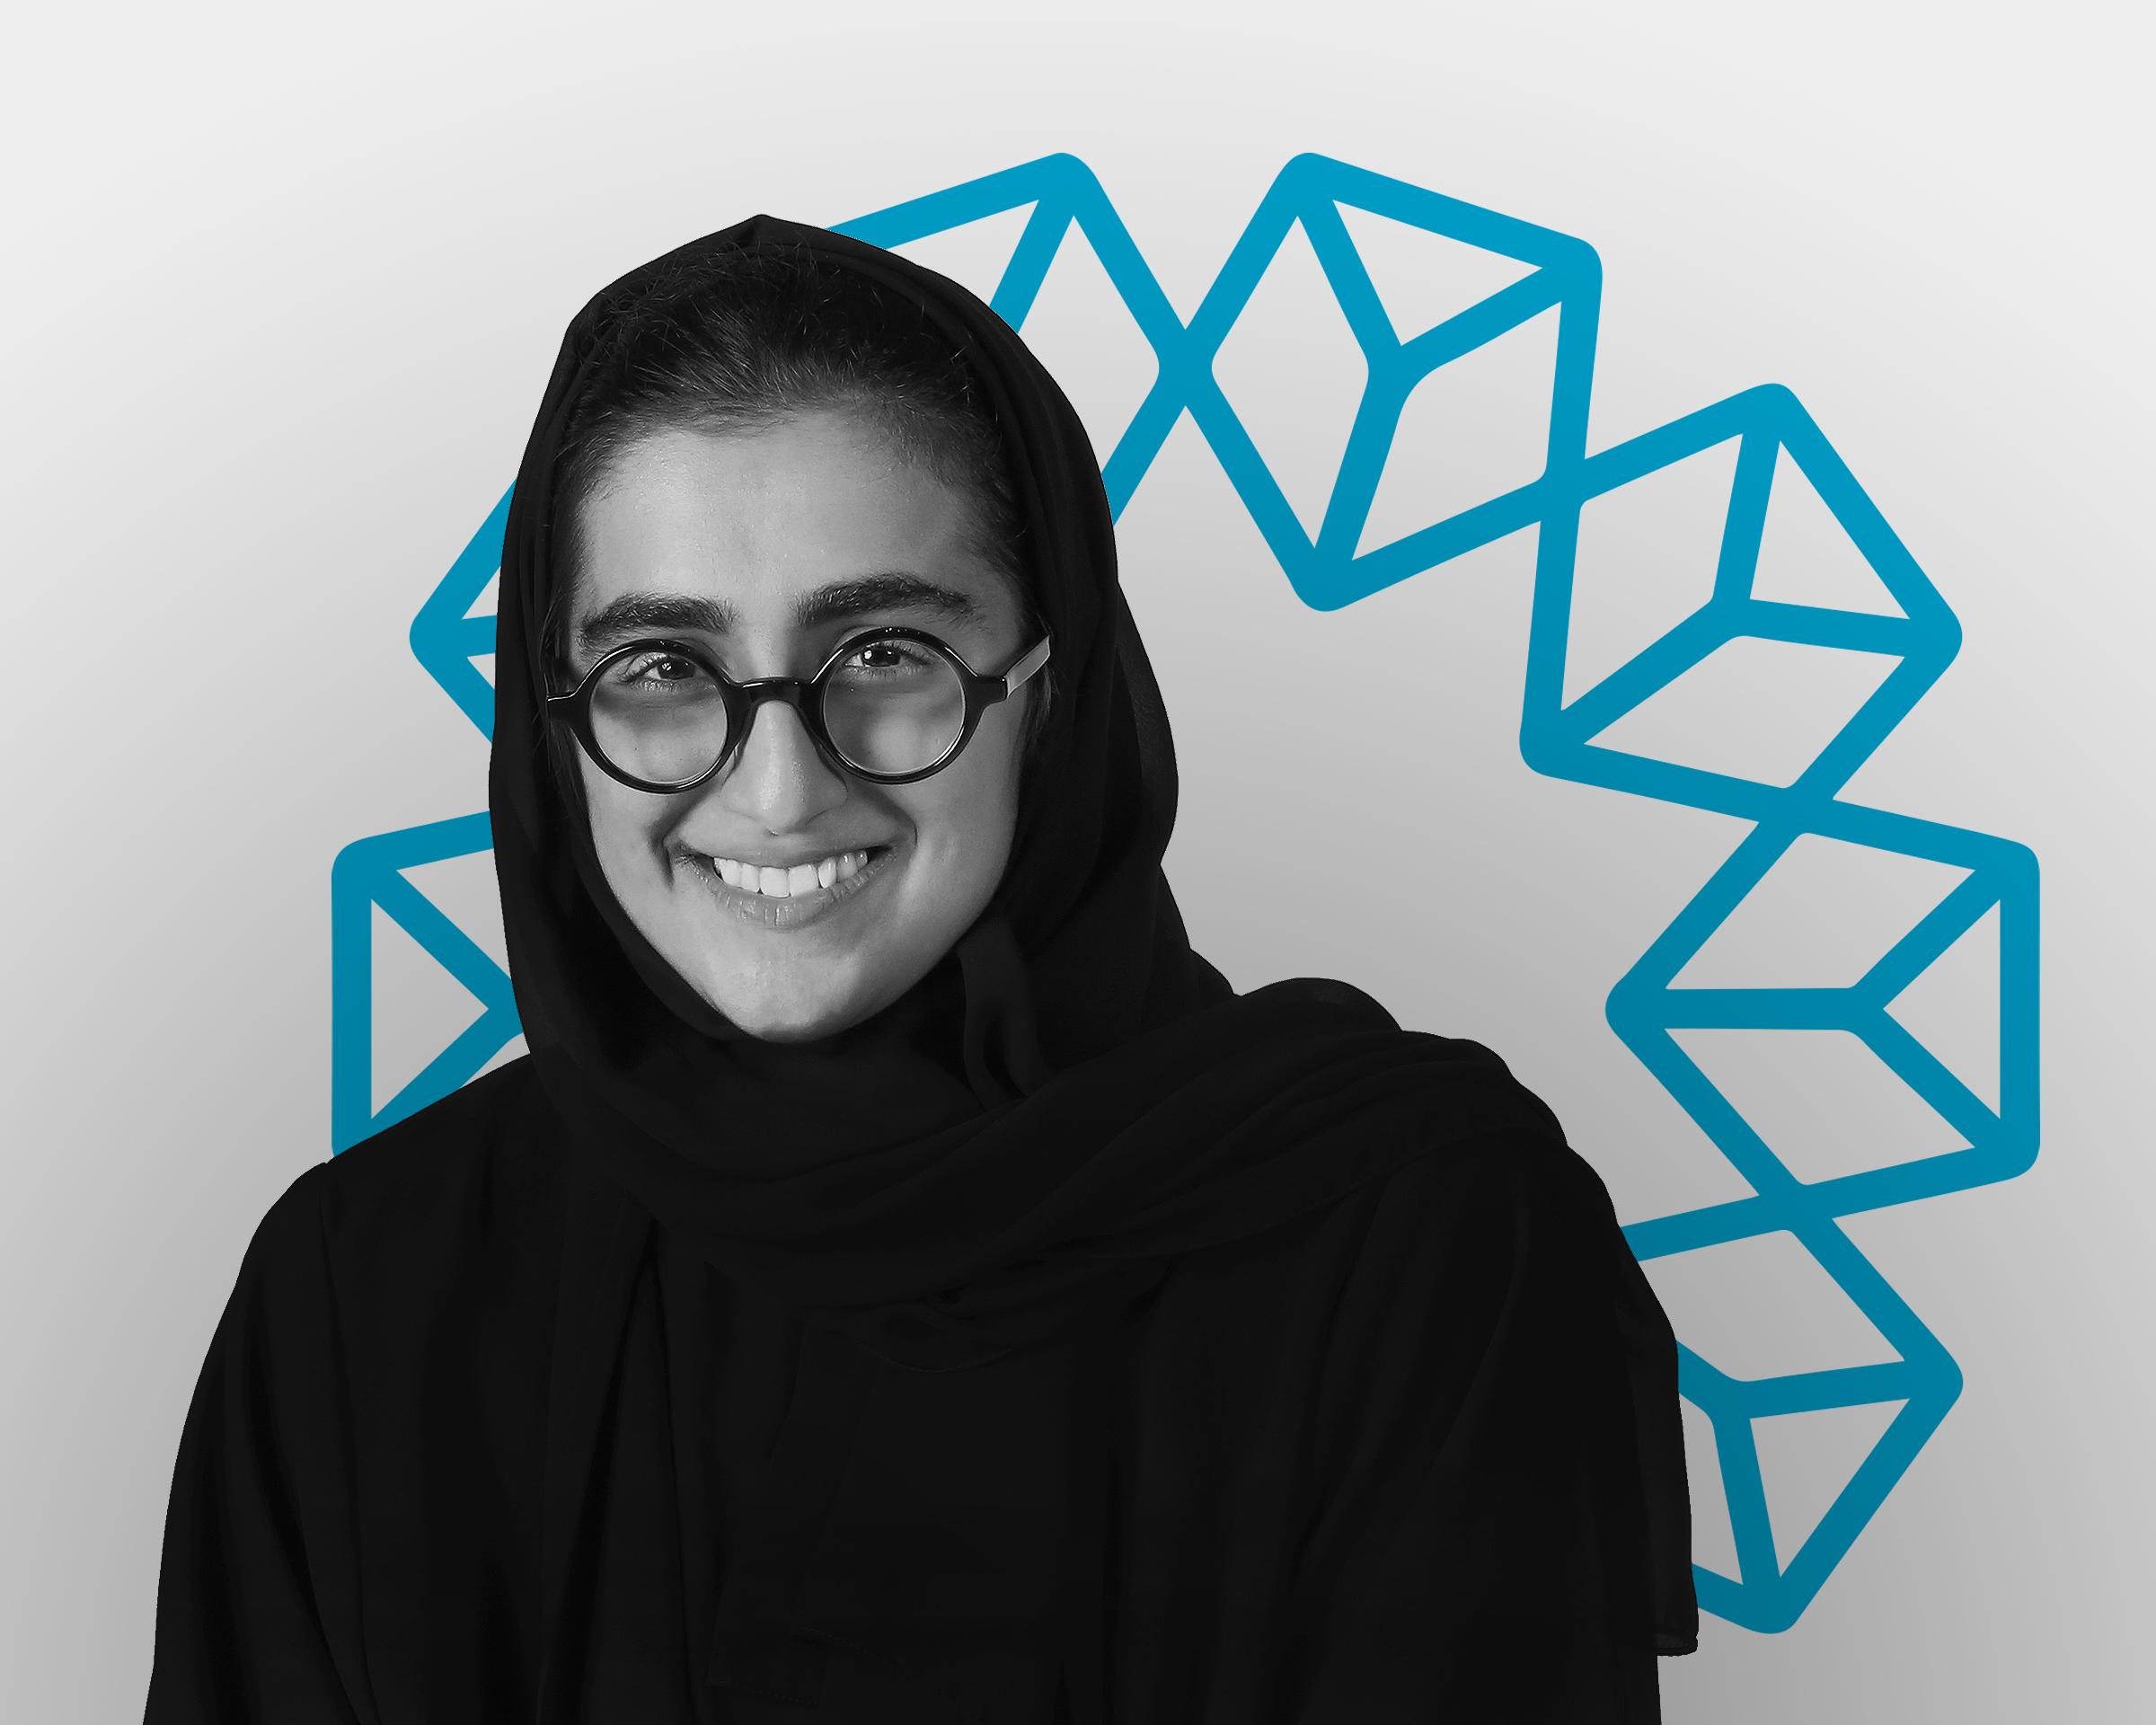 Amal A. Al-Muftah - 24 years oldNUQ'19Filmmaker